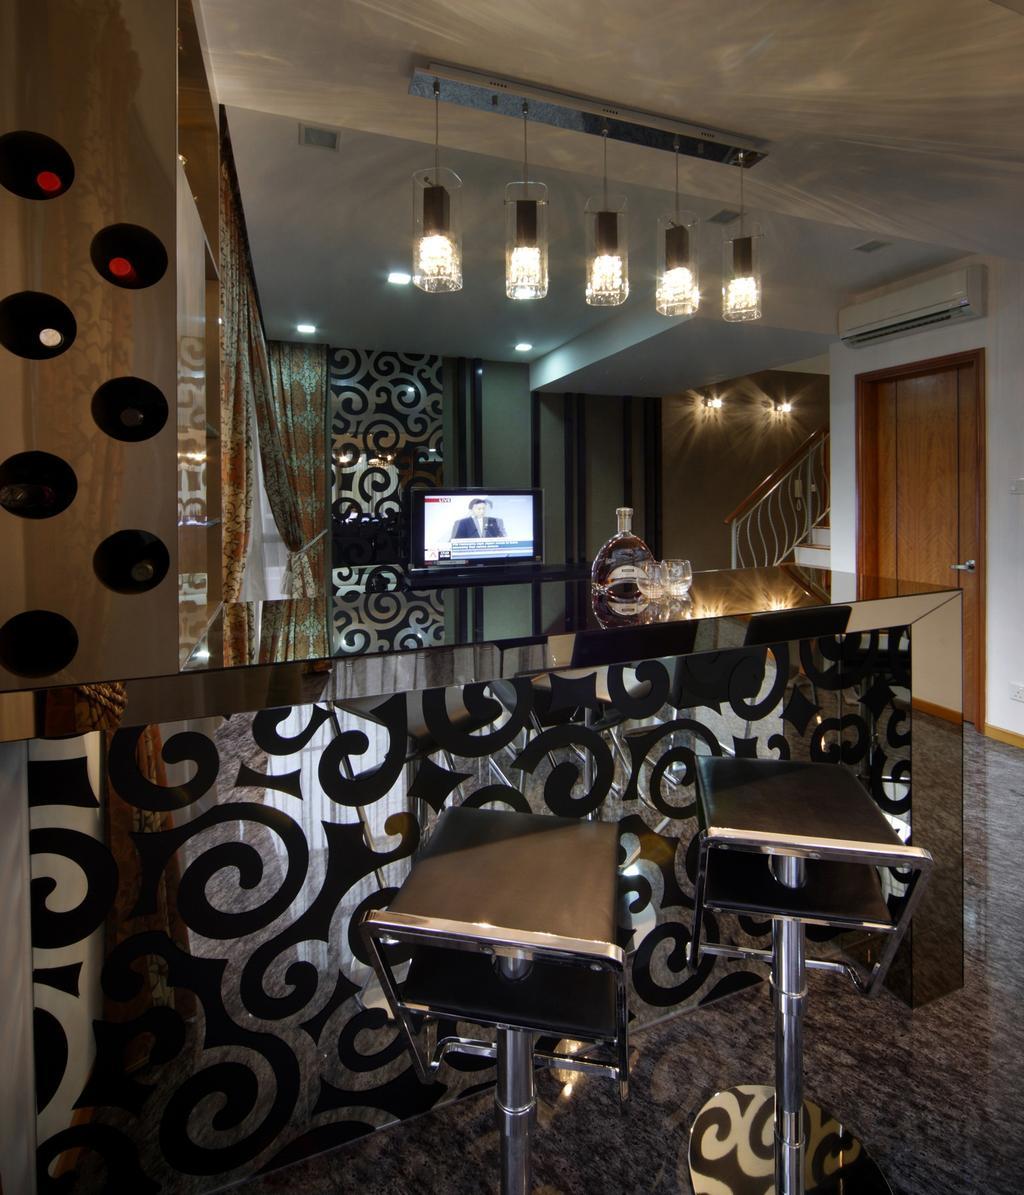 Traditional, Condo, Living Room, The Florida, Interior Designer, Chapter One Interior Design, Mirror, Hanging Light, Pendant Light, Lighting, Barstools, Bar Counter, Storage, Cubbyholes, Shelf, Shelves, White